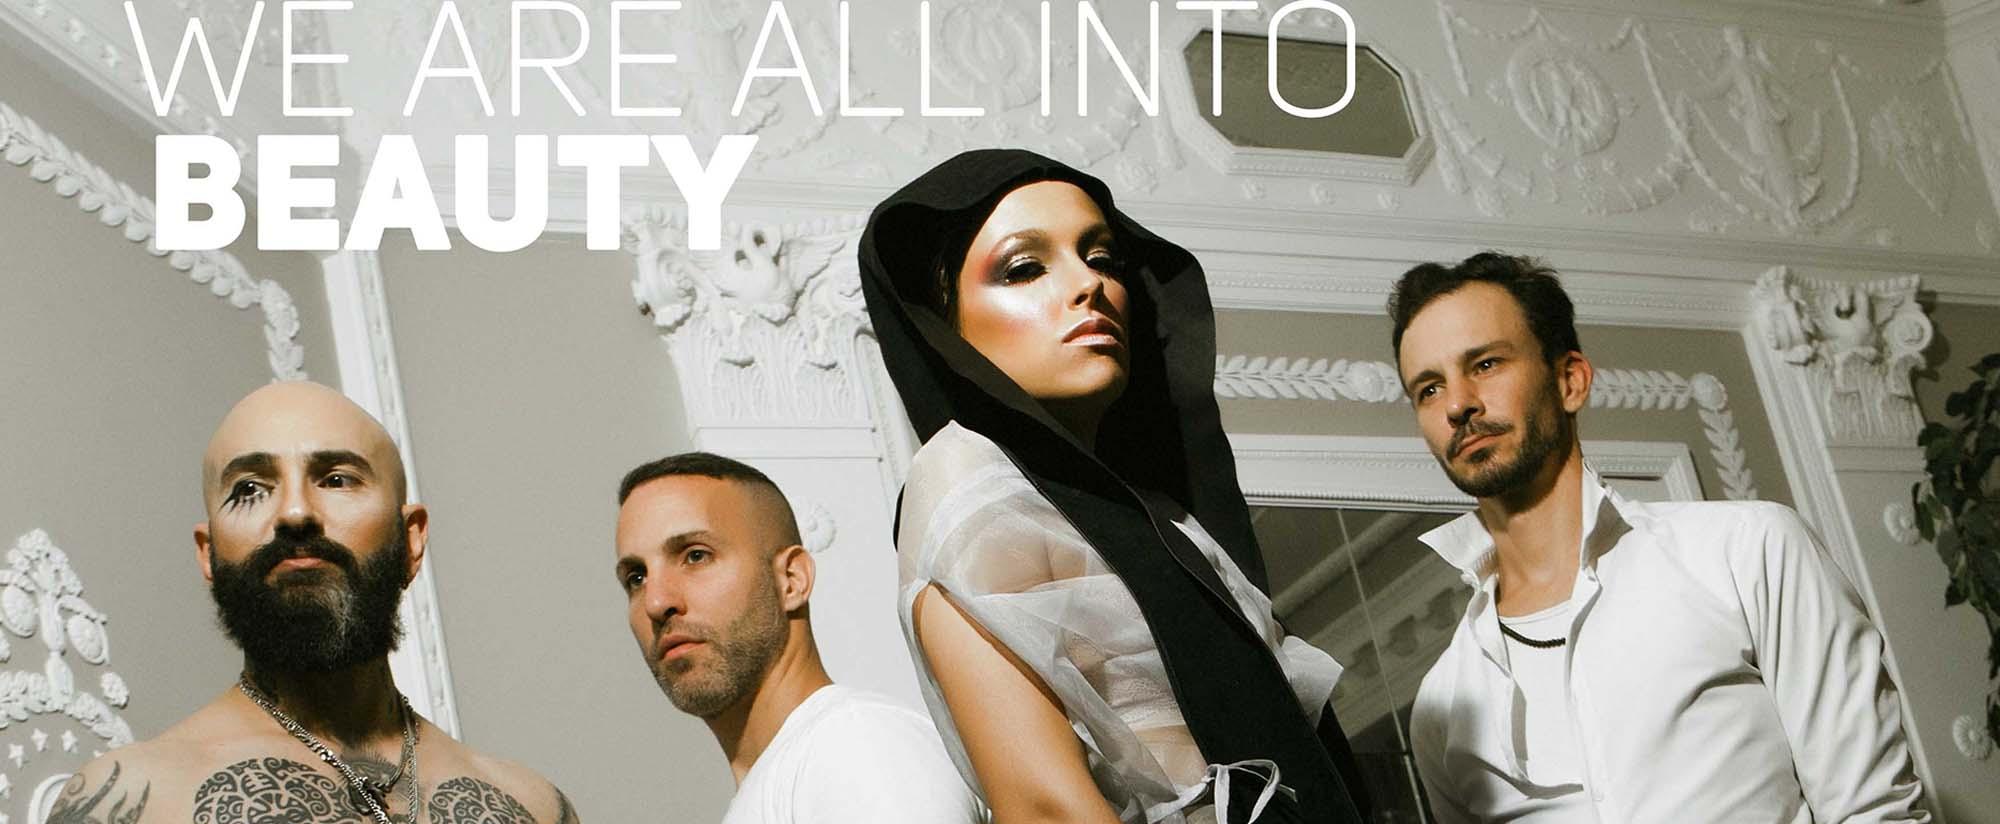 Beni Durrer, Yarin Shahaf, איפור, מגזין אופנה -